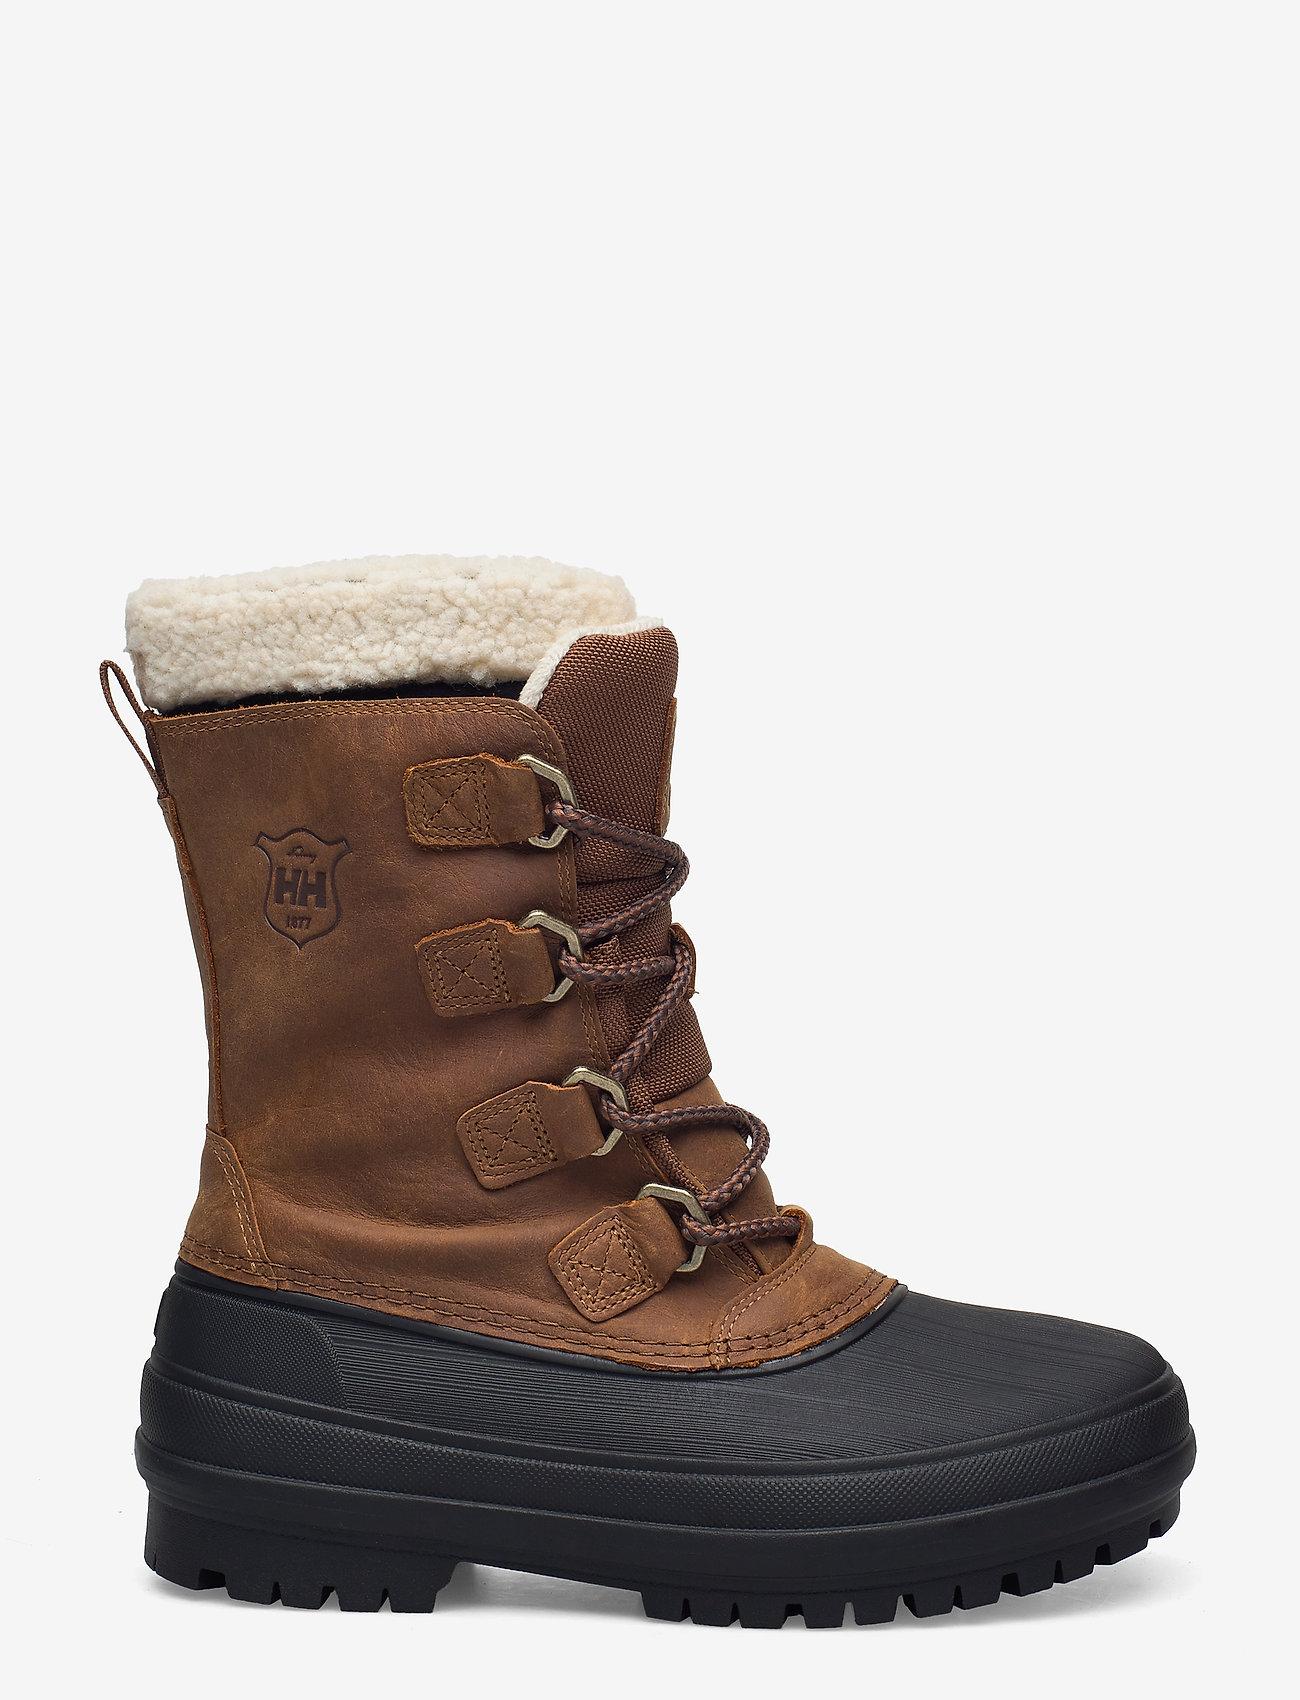 Helly Hansen - W VARANGER PRIMALOFT - flat ankle boots - 741 bistre / black - 1